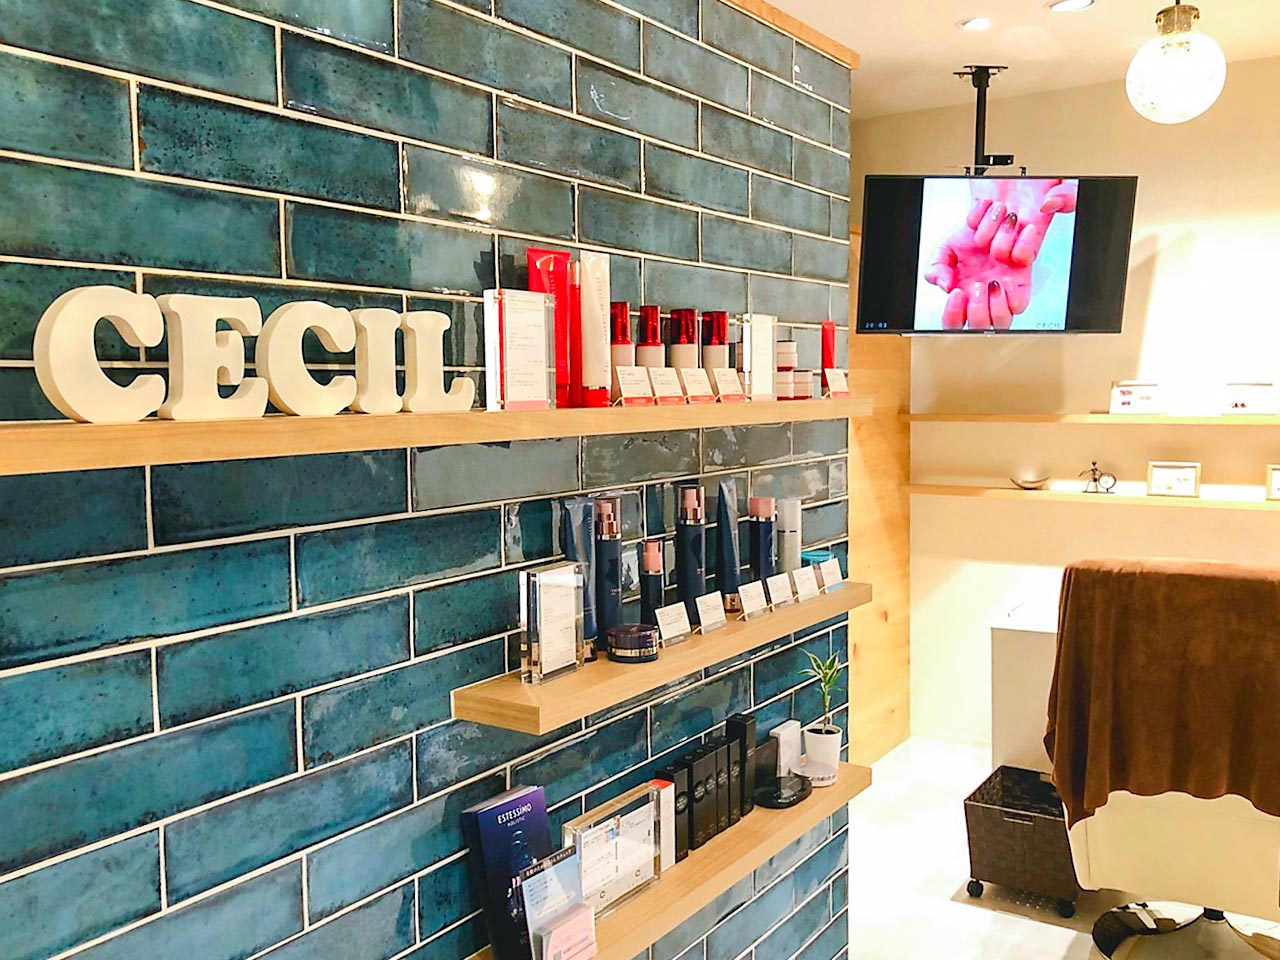 CECIL beauty labo<small>セシルビューティーラボ</small>